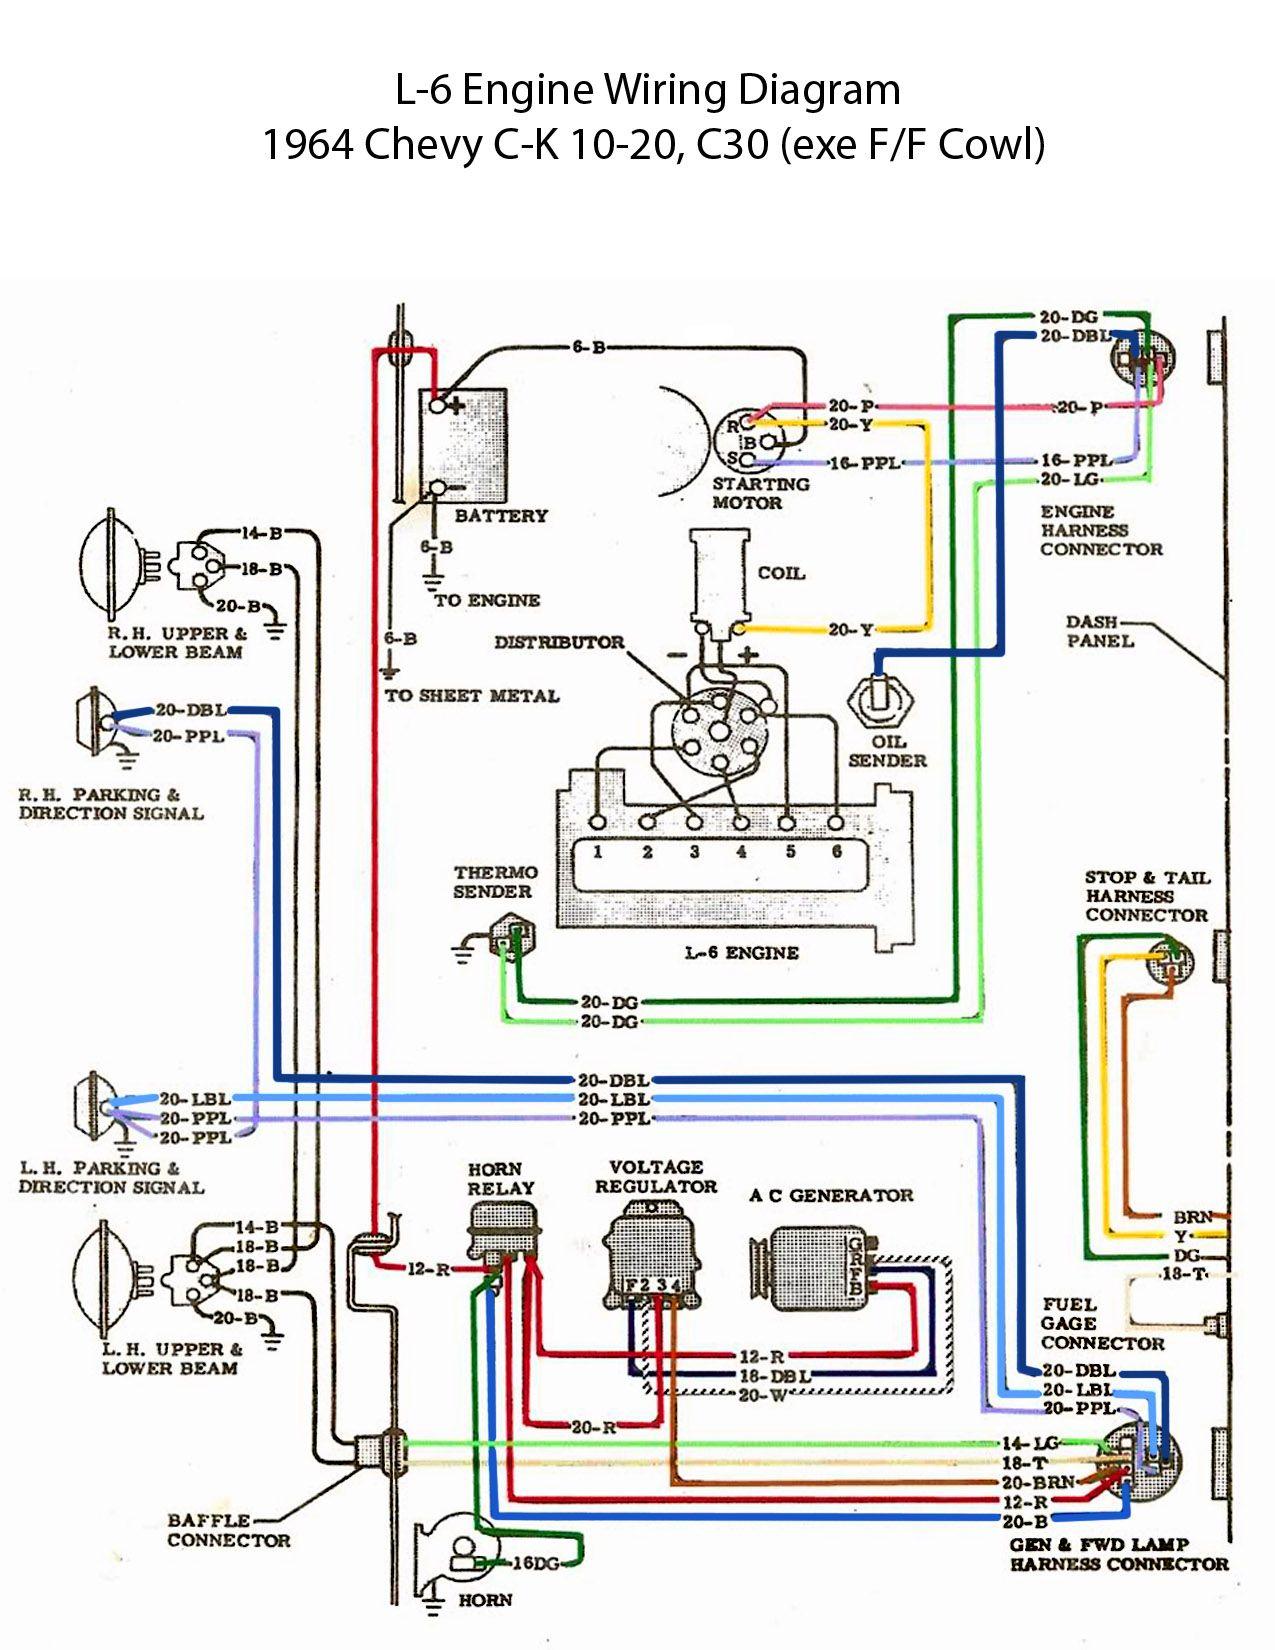 Wondrous Electric L 6 Engine Wiring Diagram 60S Chevy C10 Wiring Wiring Cloud Cranvenetmohammedshrineorg